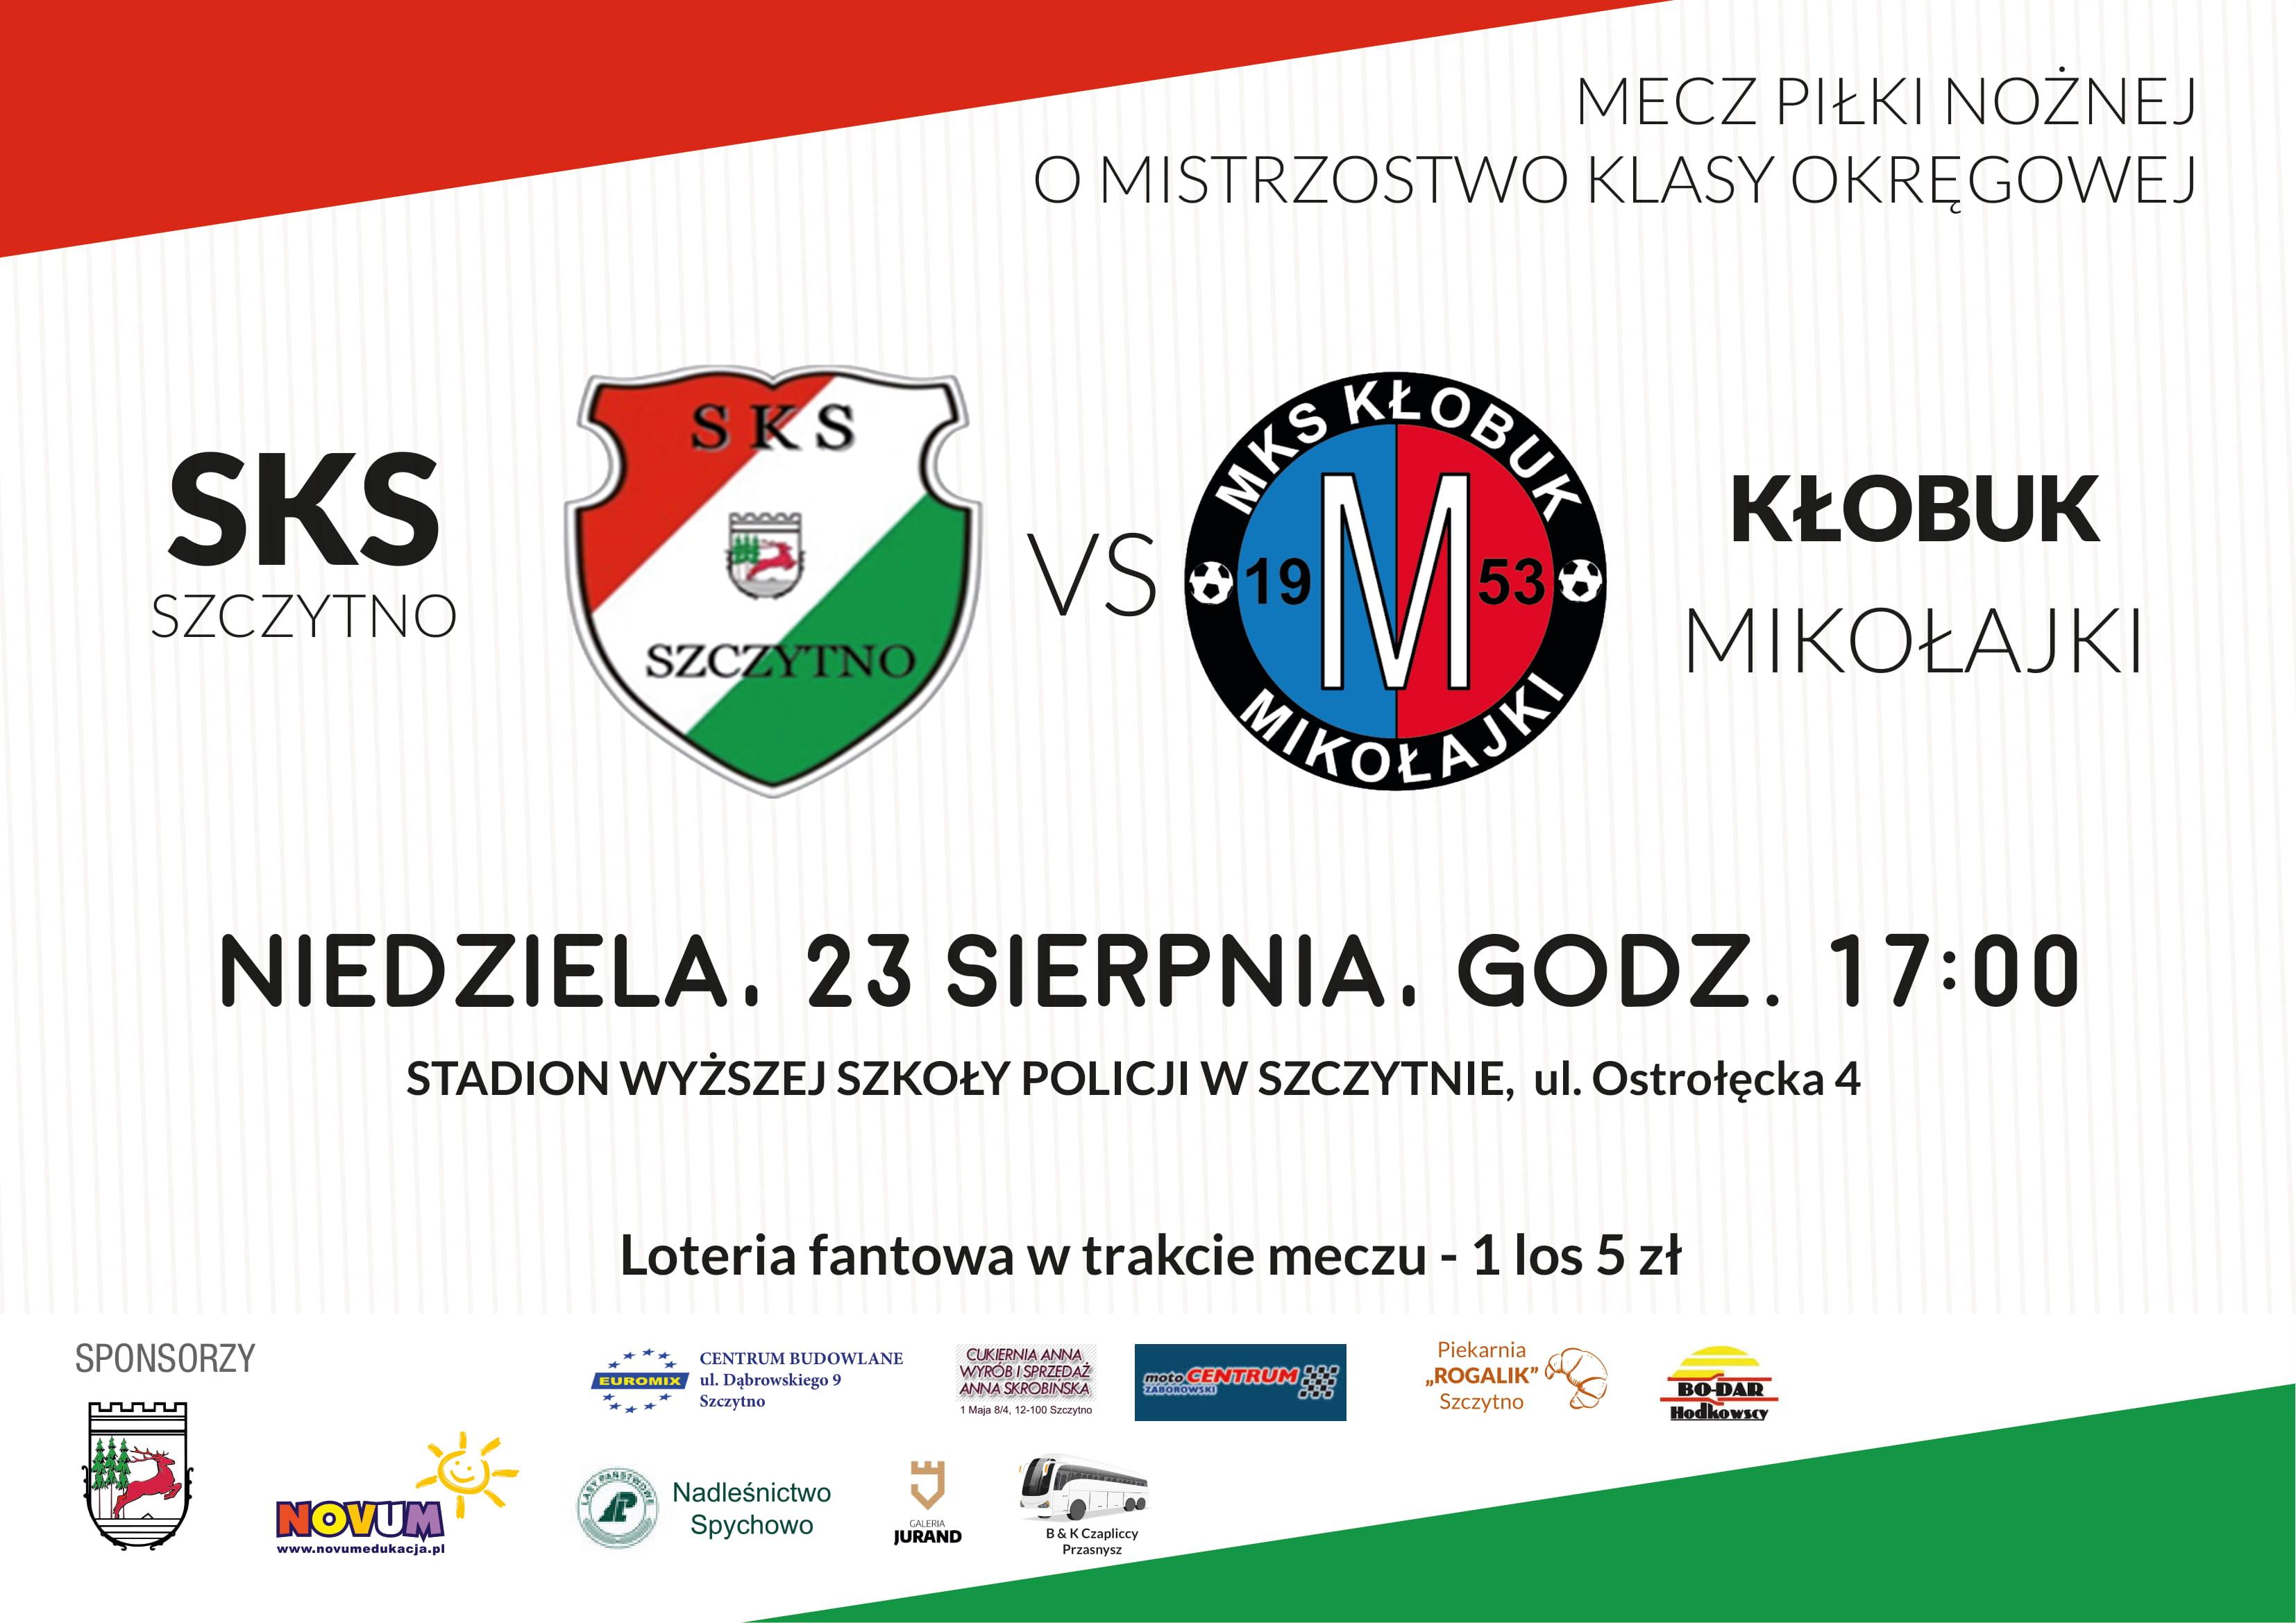 https://m.powiatszczycienski.pl/2020/08/orig/plakat-a3-mikolajki-2020-1-33832.jpg